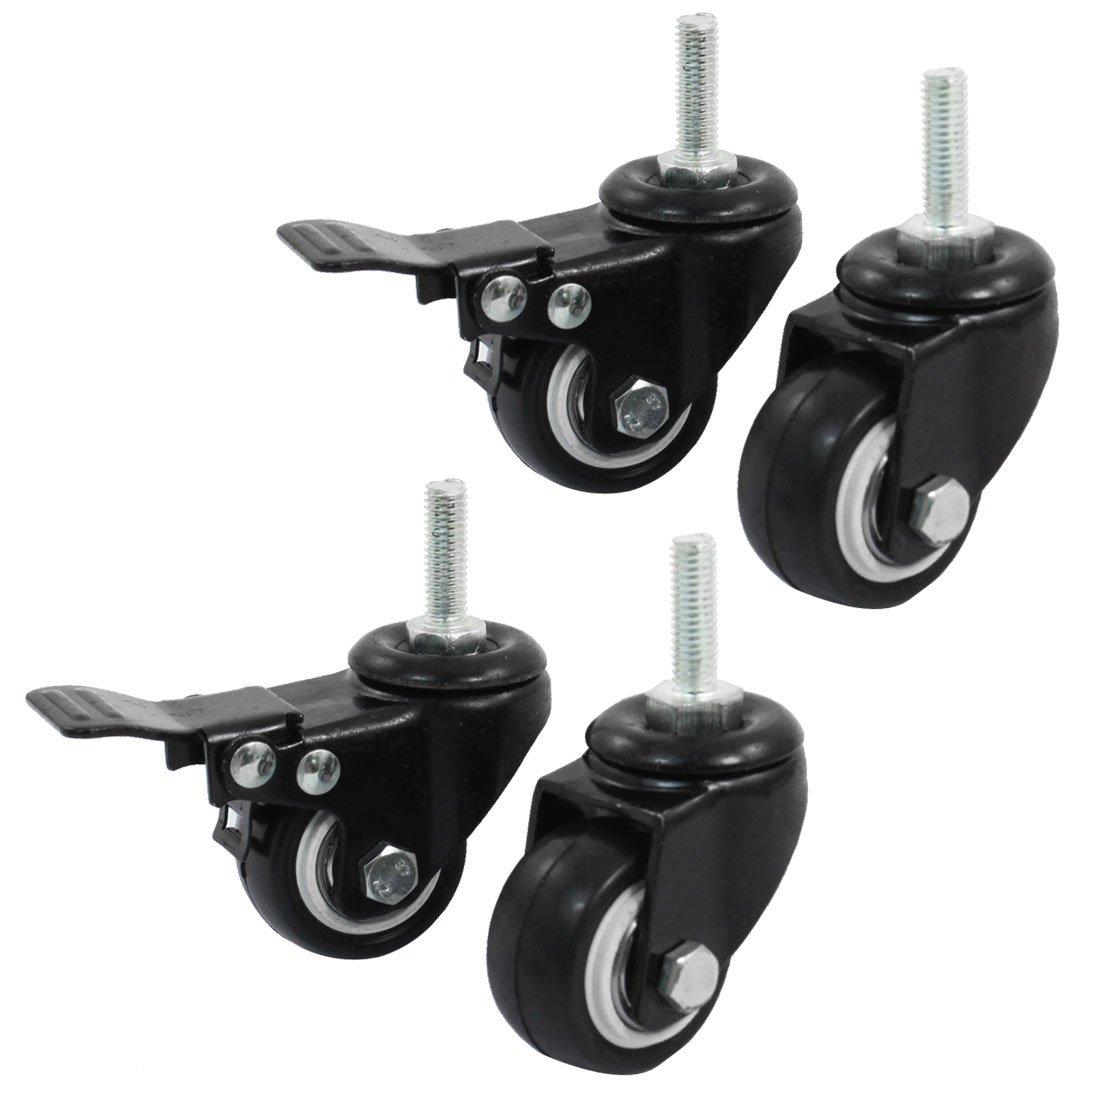 Uxcell a14071600ux0660 Shopping Wheel Trolley Brake Swivel Caster 1.5 Inch Black 4 Piece